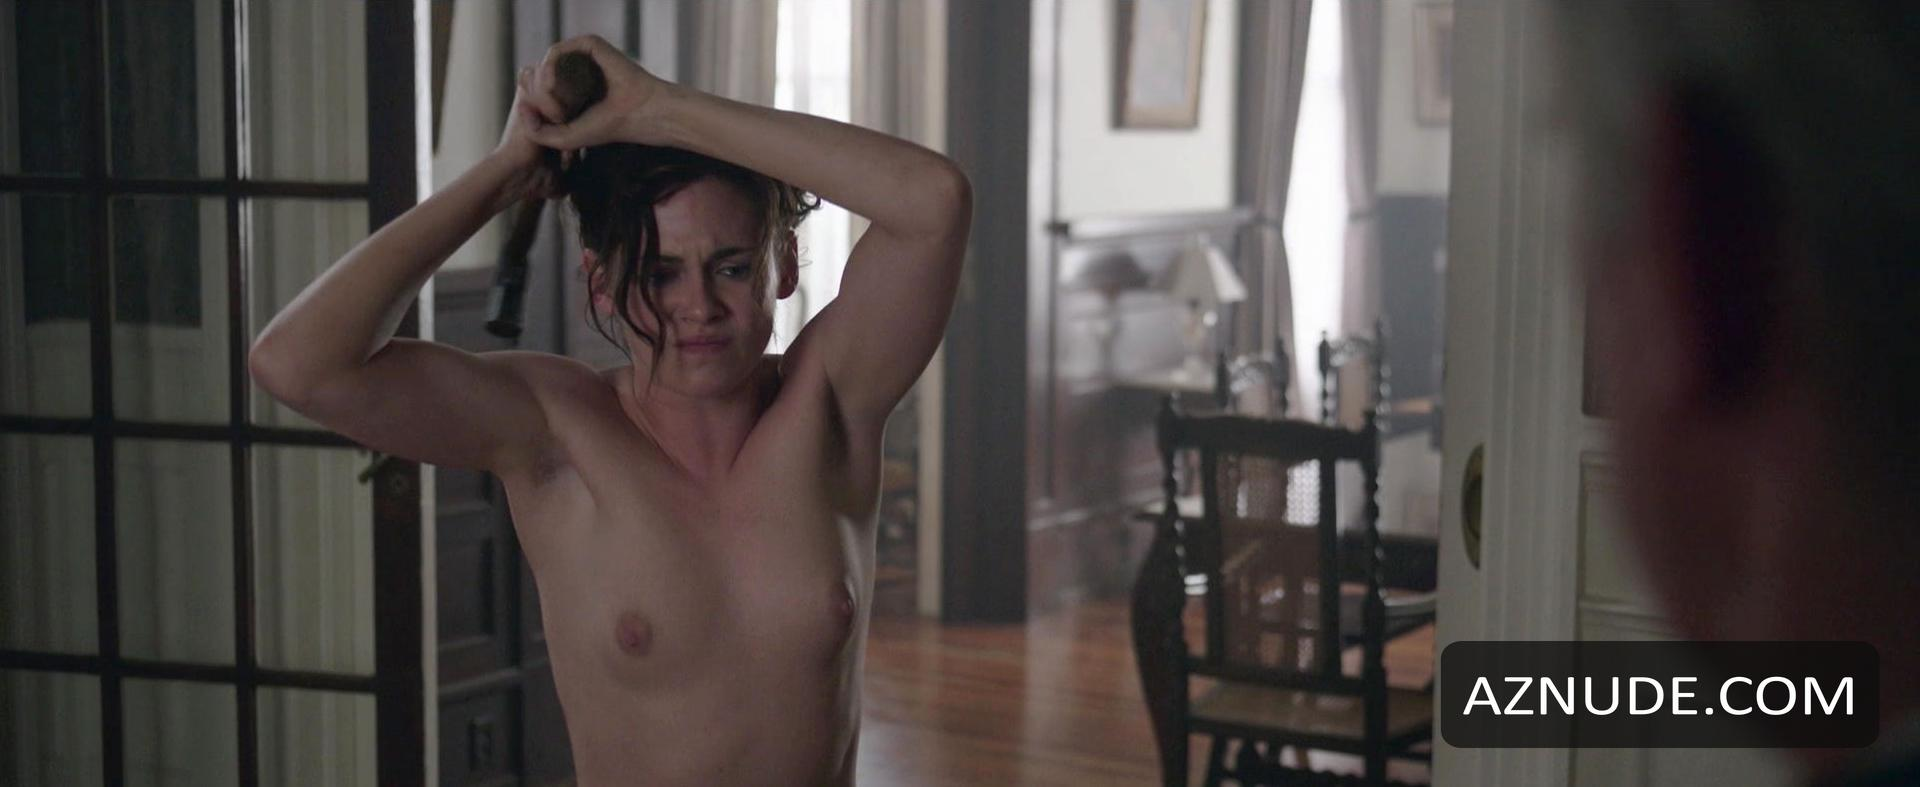 Kristen Stewart Nude - Aznude-2232